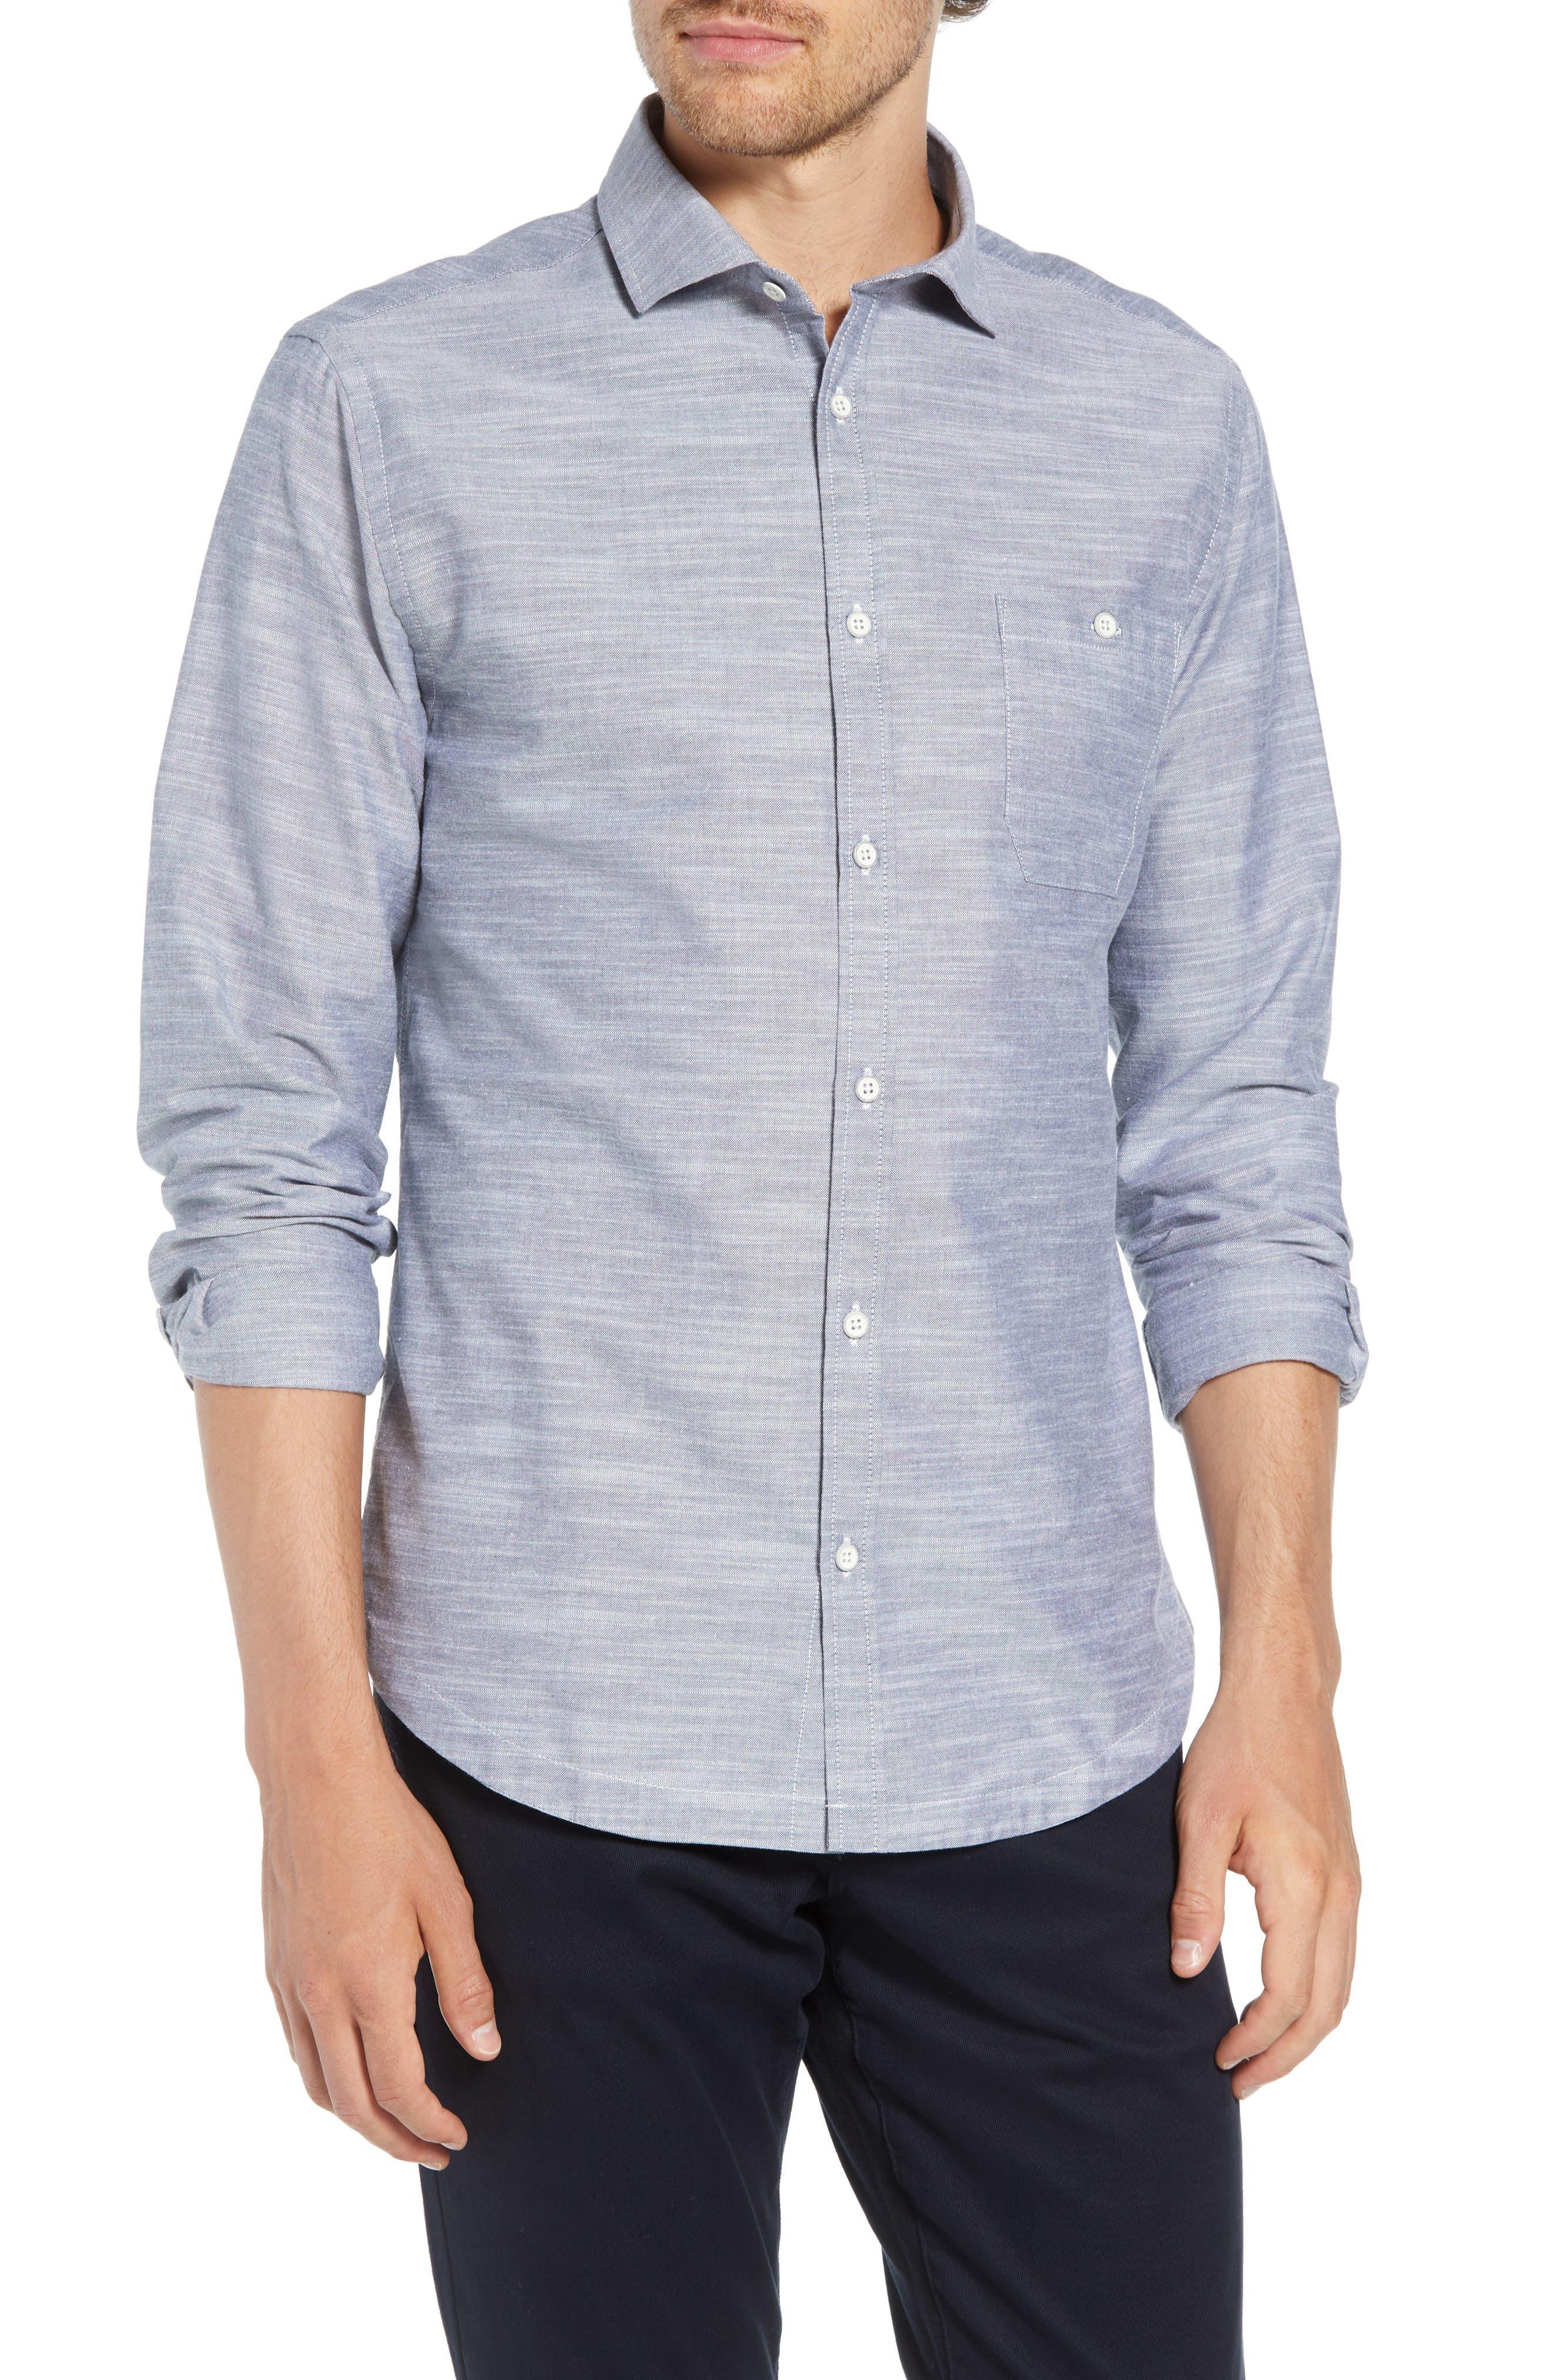 Rugger Regular Fit Sport Shirt,                             Main thumbnail 1, color,                             029